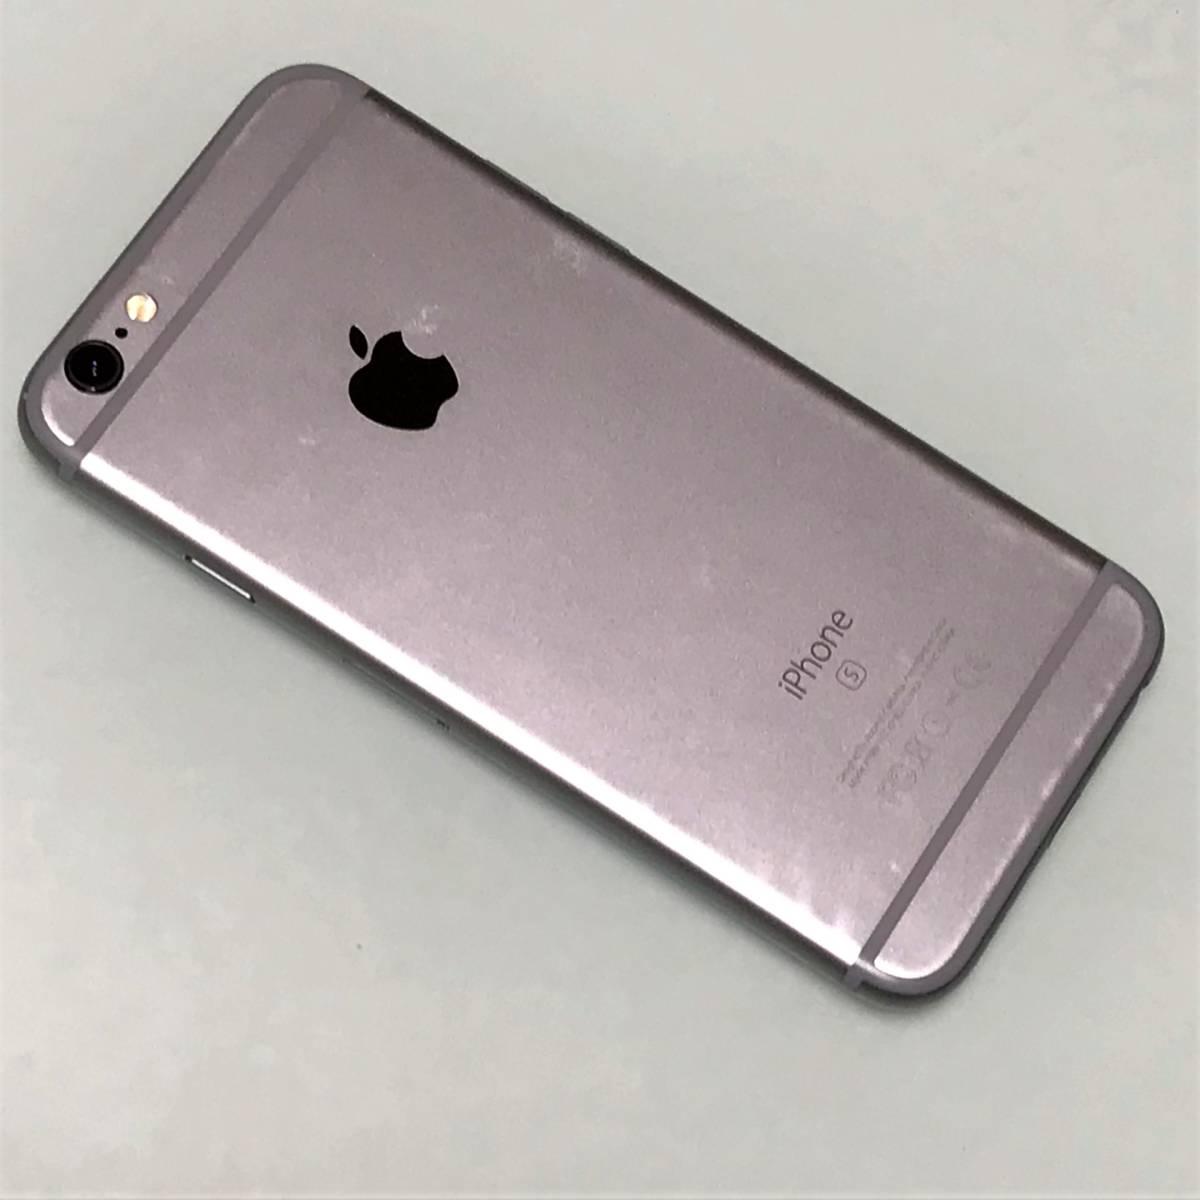 SIMフリー iPhone 6S スペースグレイ 128GB MKQT2J/A バッテリー容量100% アクティベーションロック解除済 docomo MVNO可 SIMロック解除済_画像4